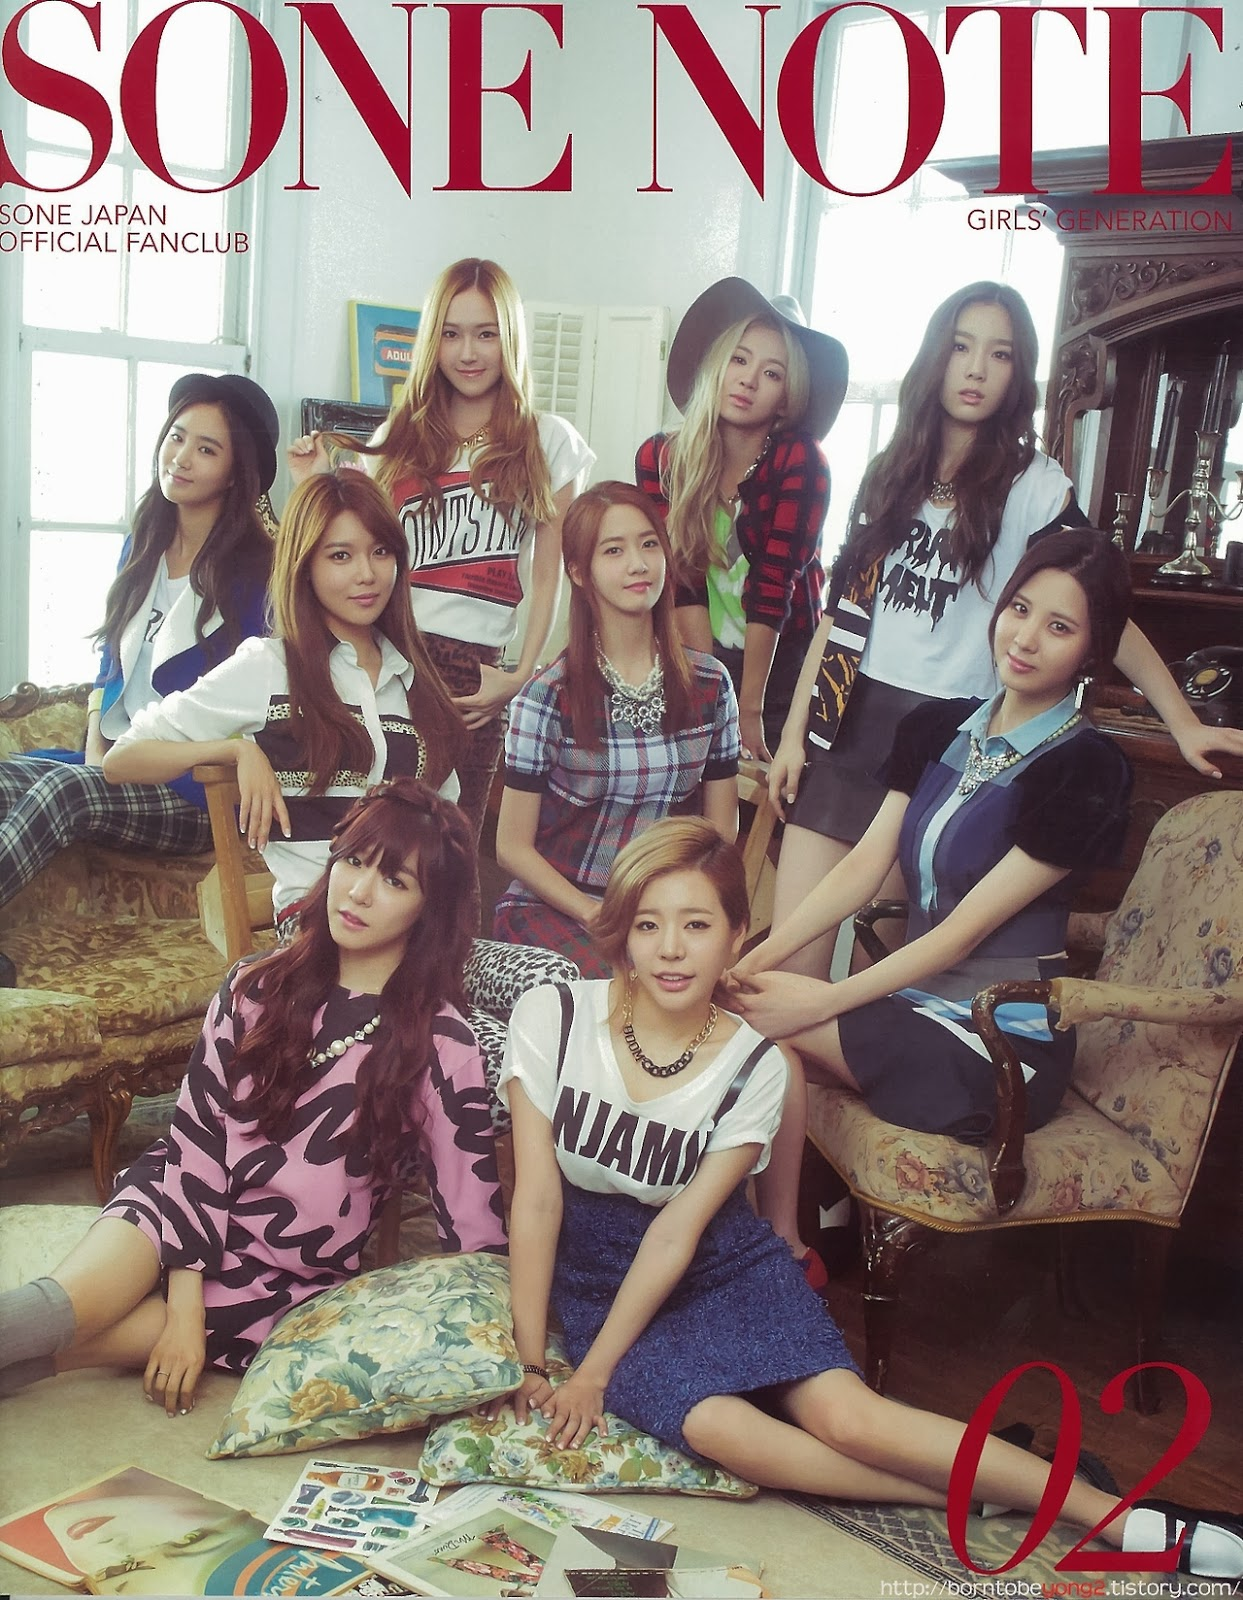 Girls' Generation SNSD - Sone Note Magazine Vol.2